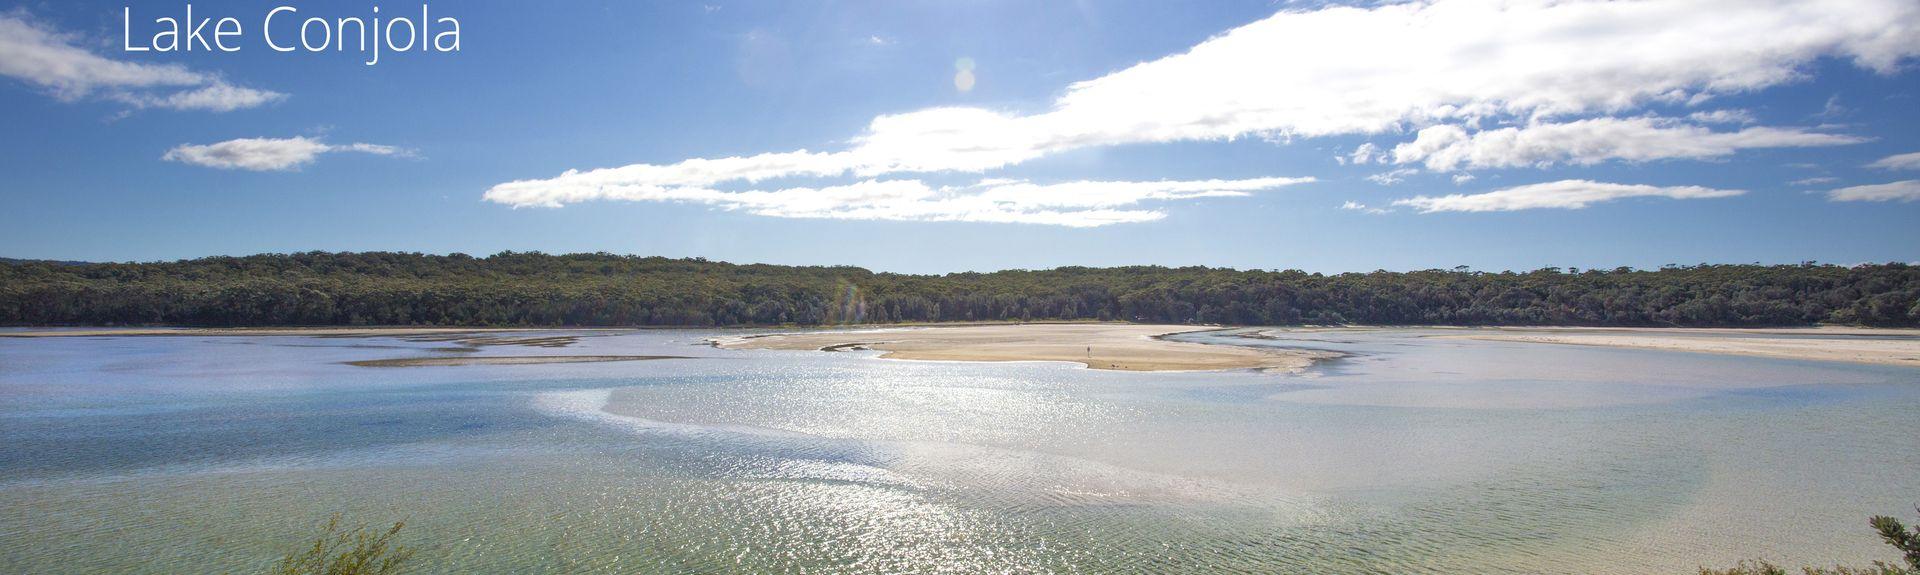 Ulladulla, New South Wales, Australien